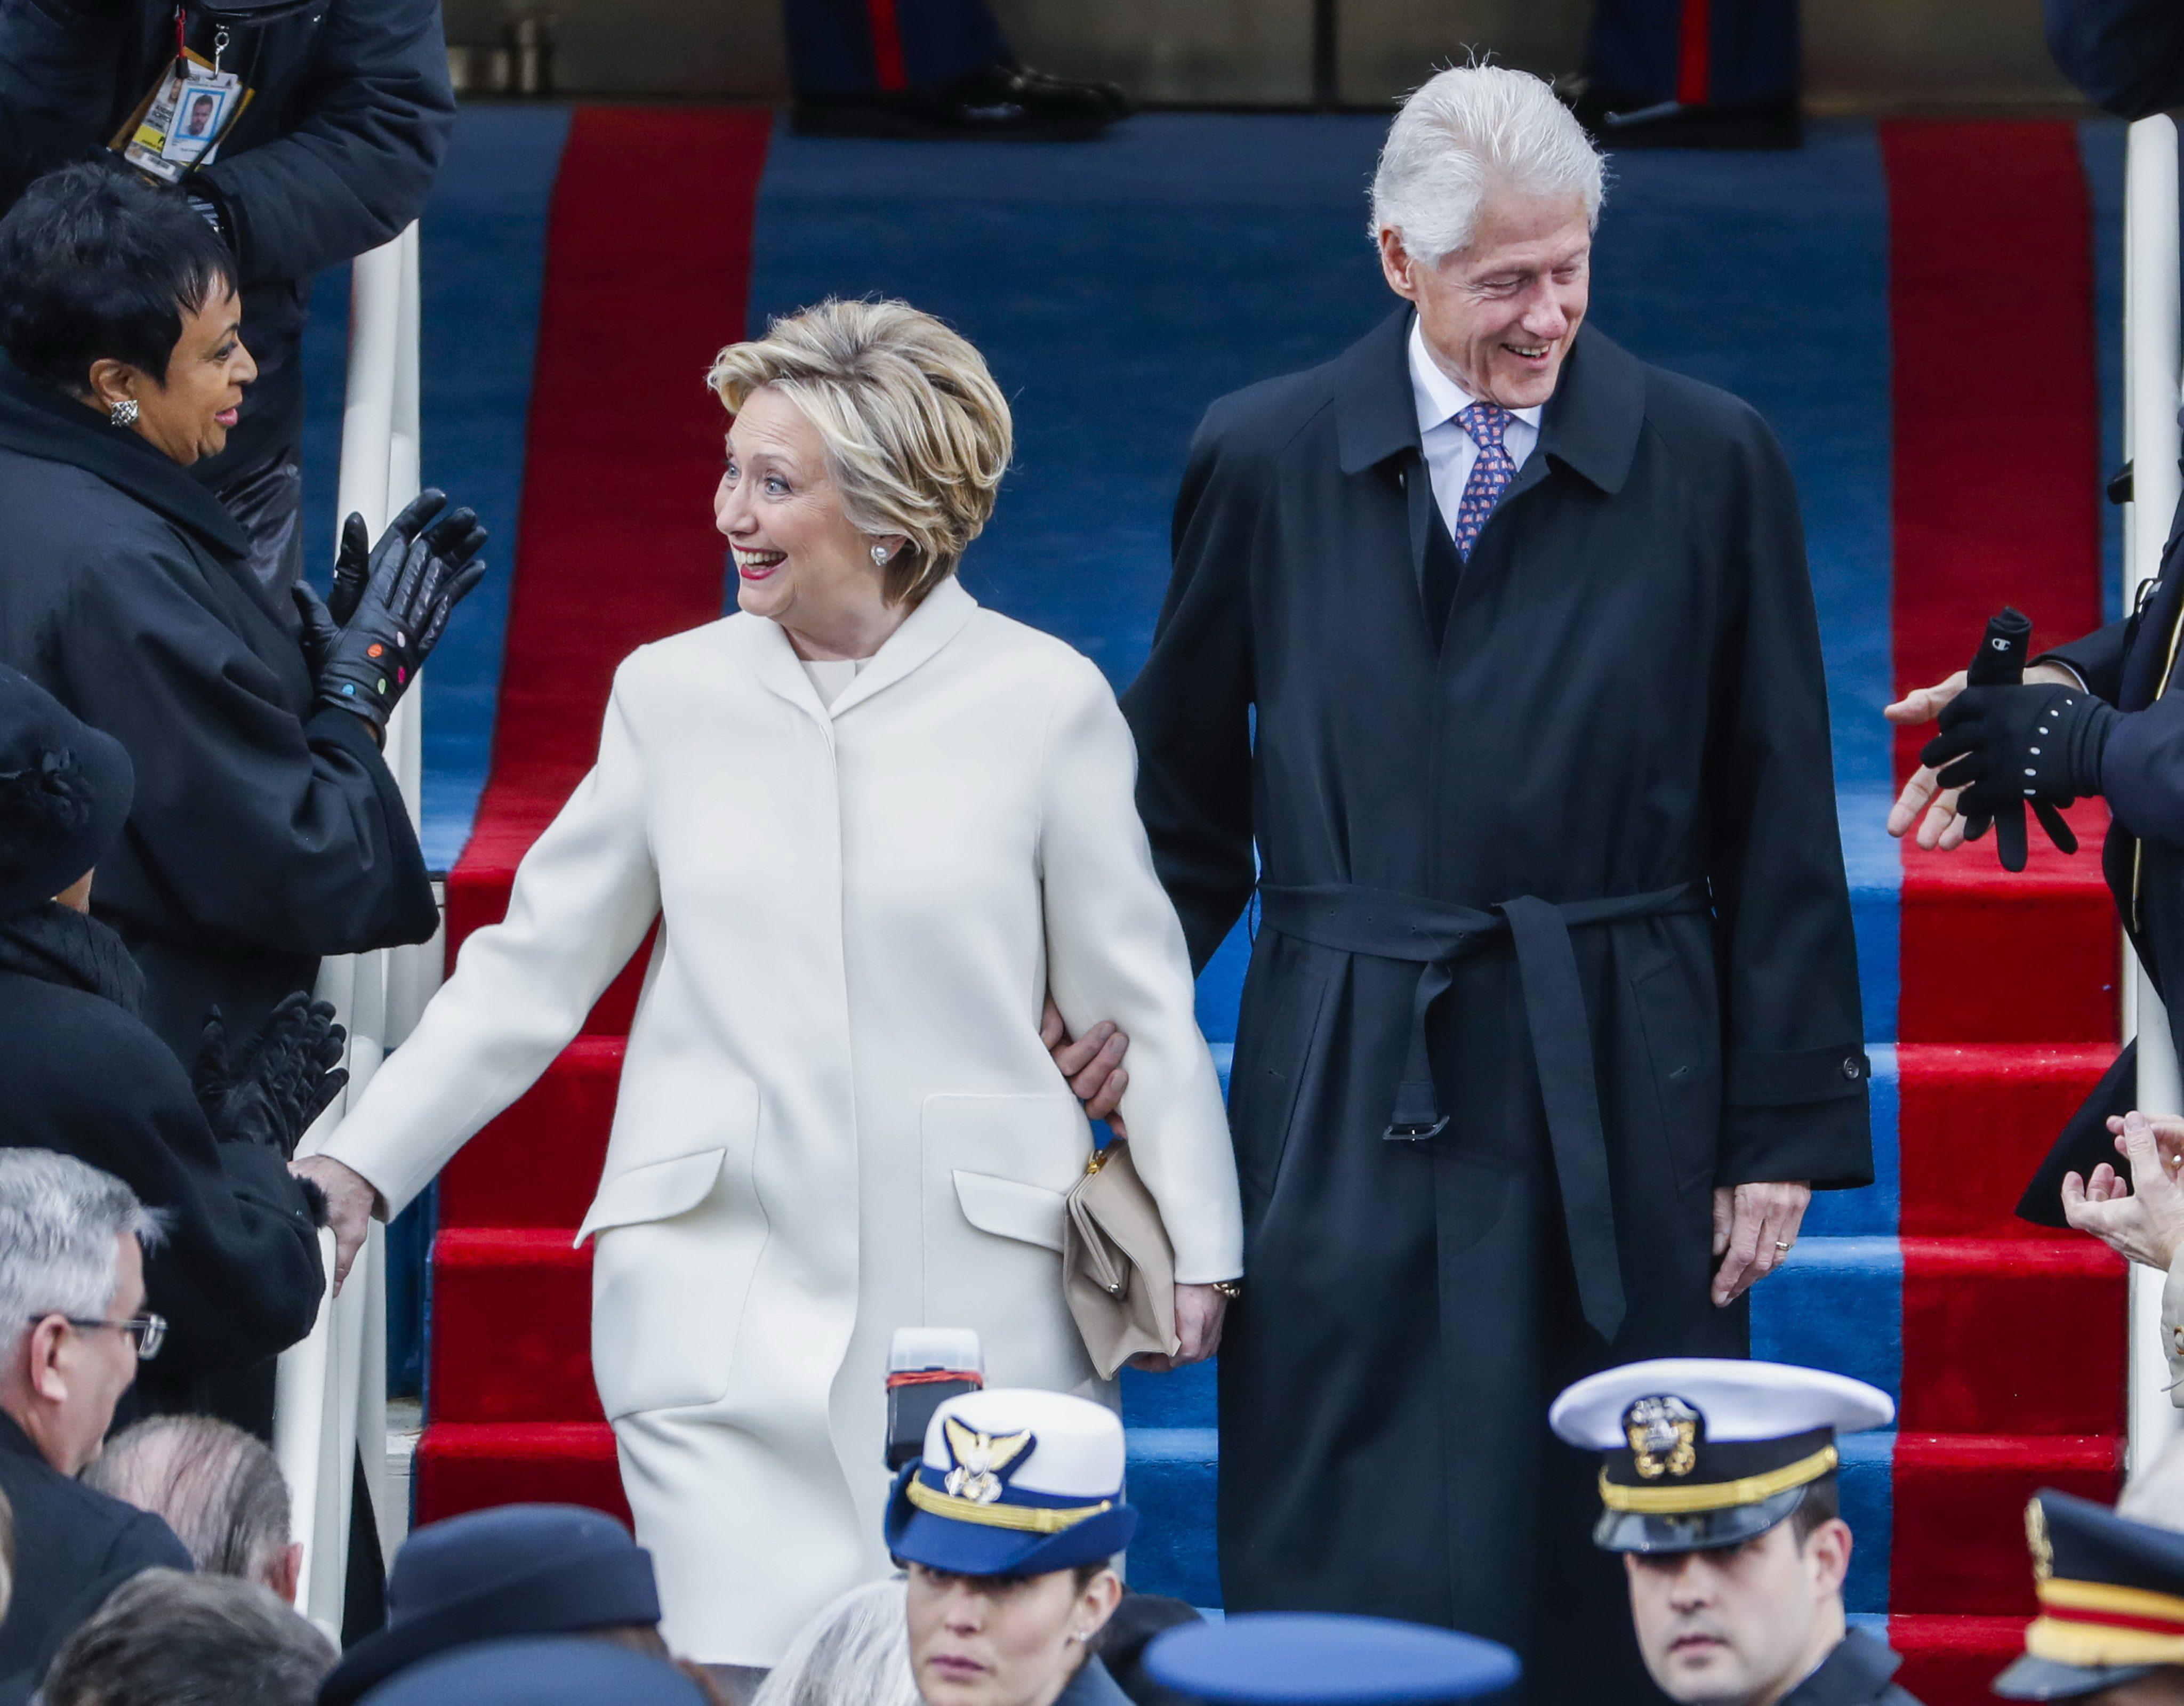 Trump i-a adus un omagiu lui Hillary Clinton in Congresul american: